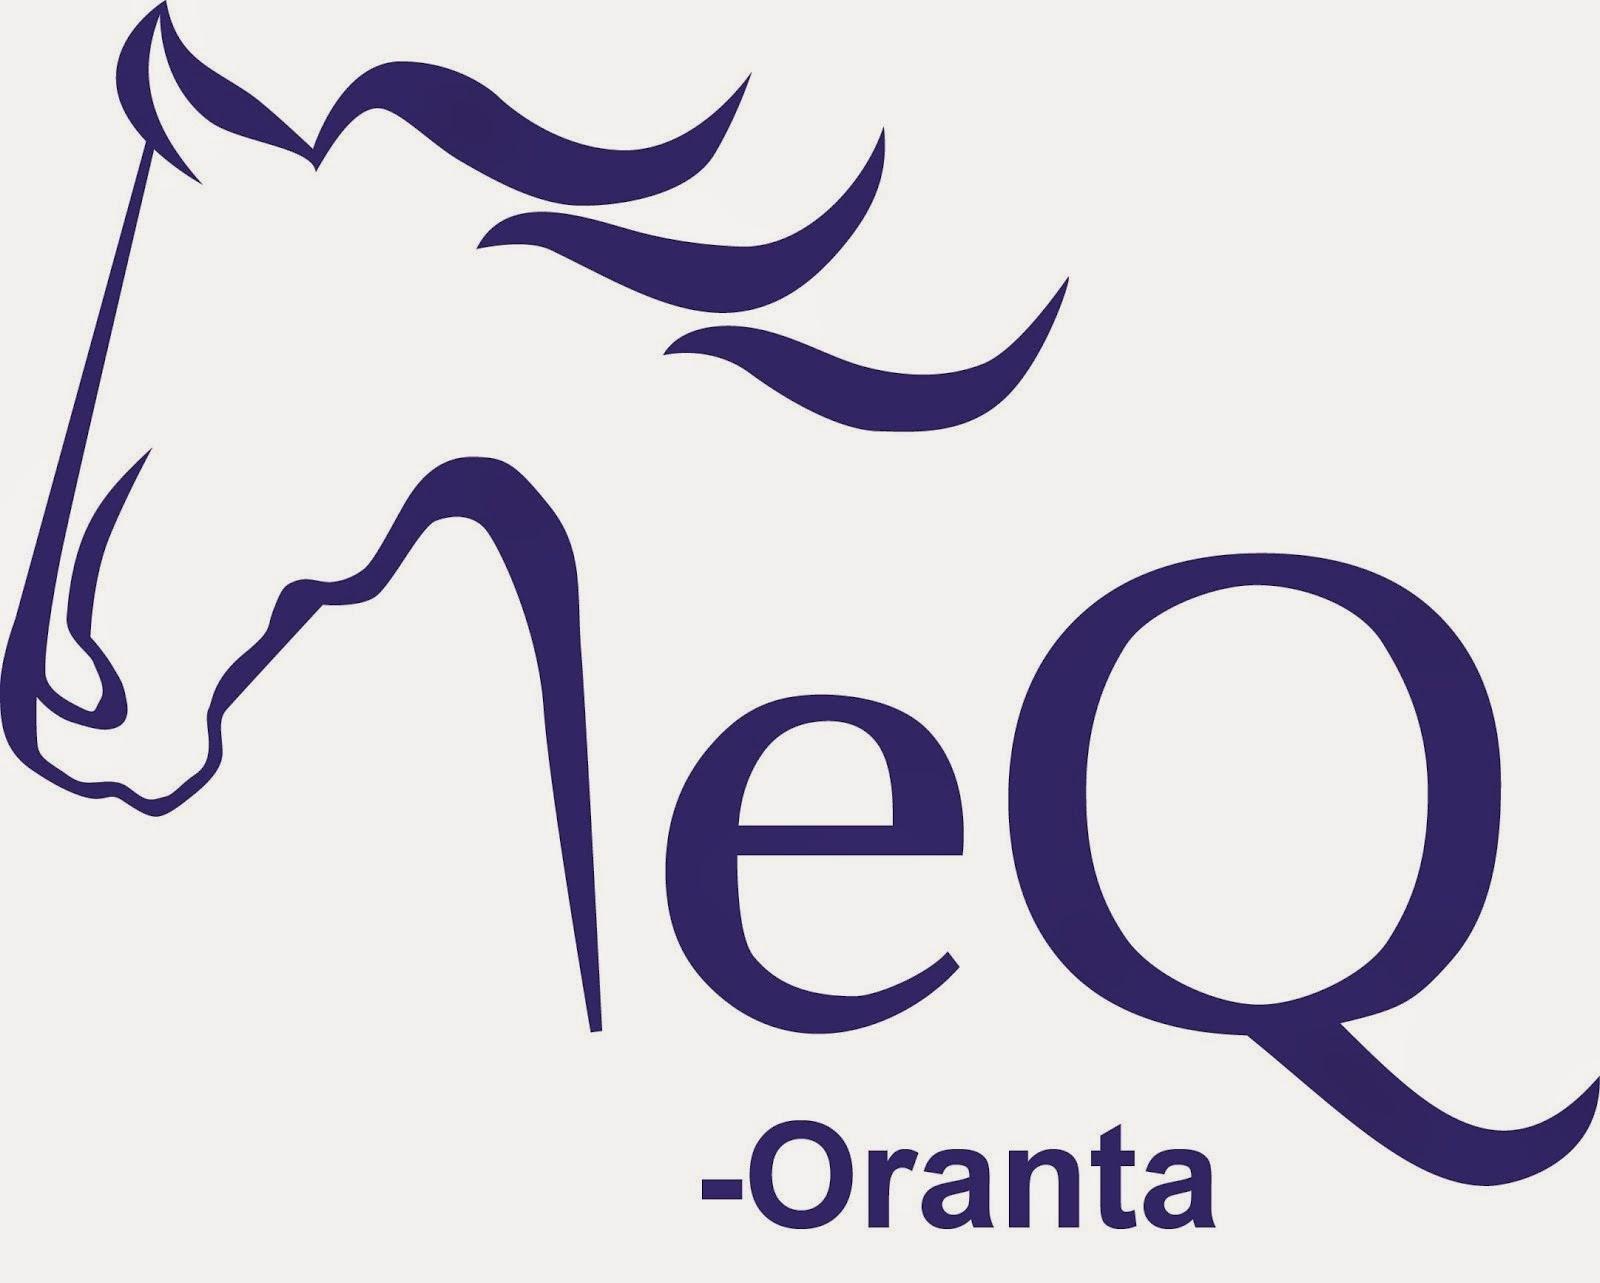 eQ-Oranta